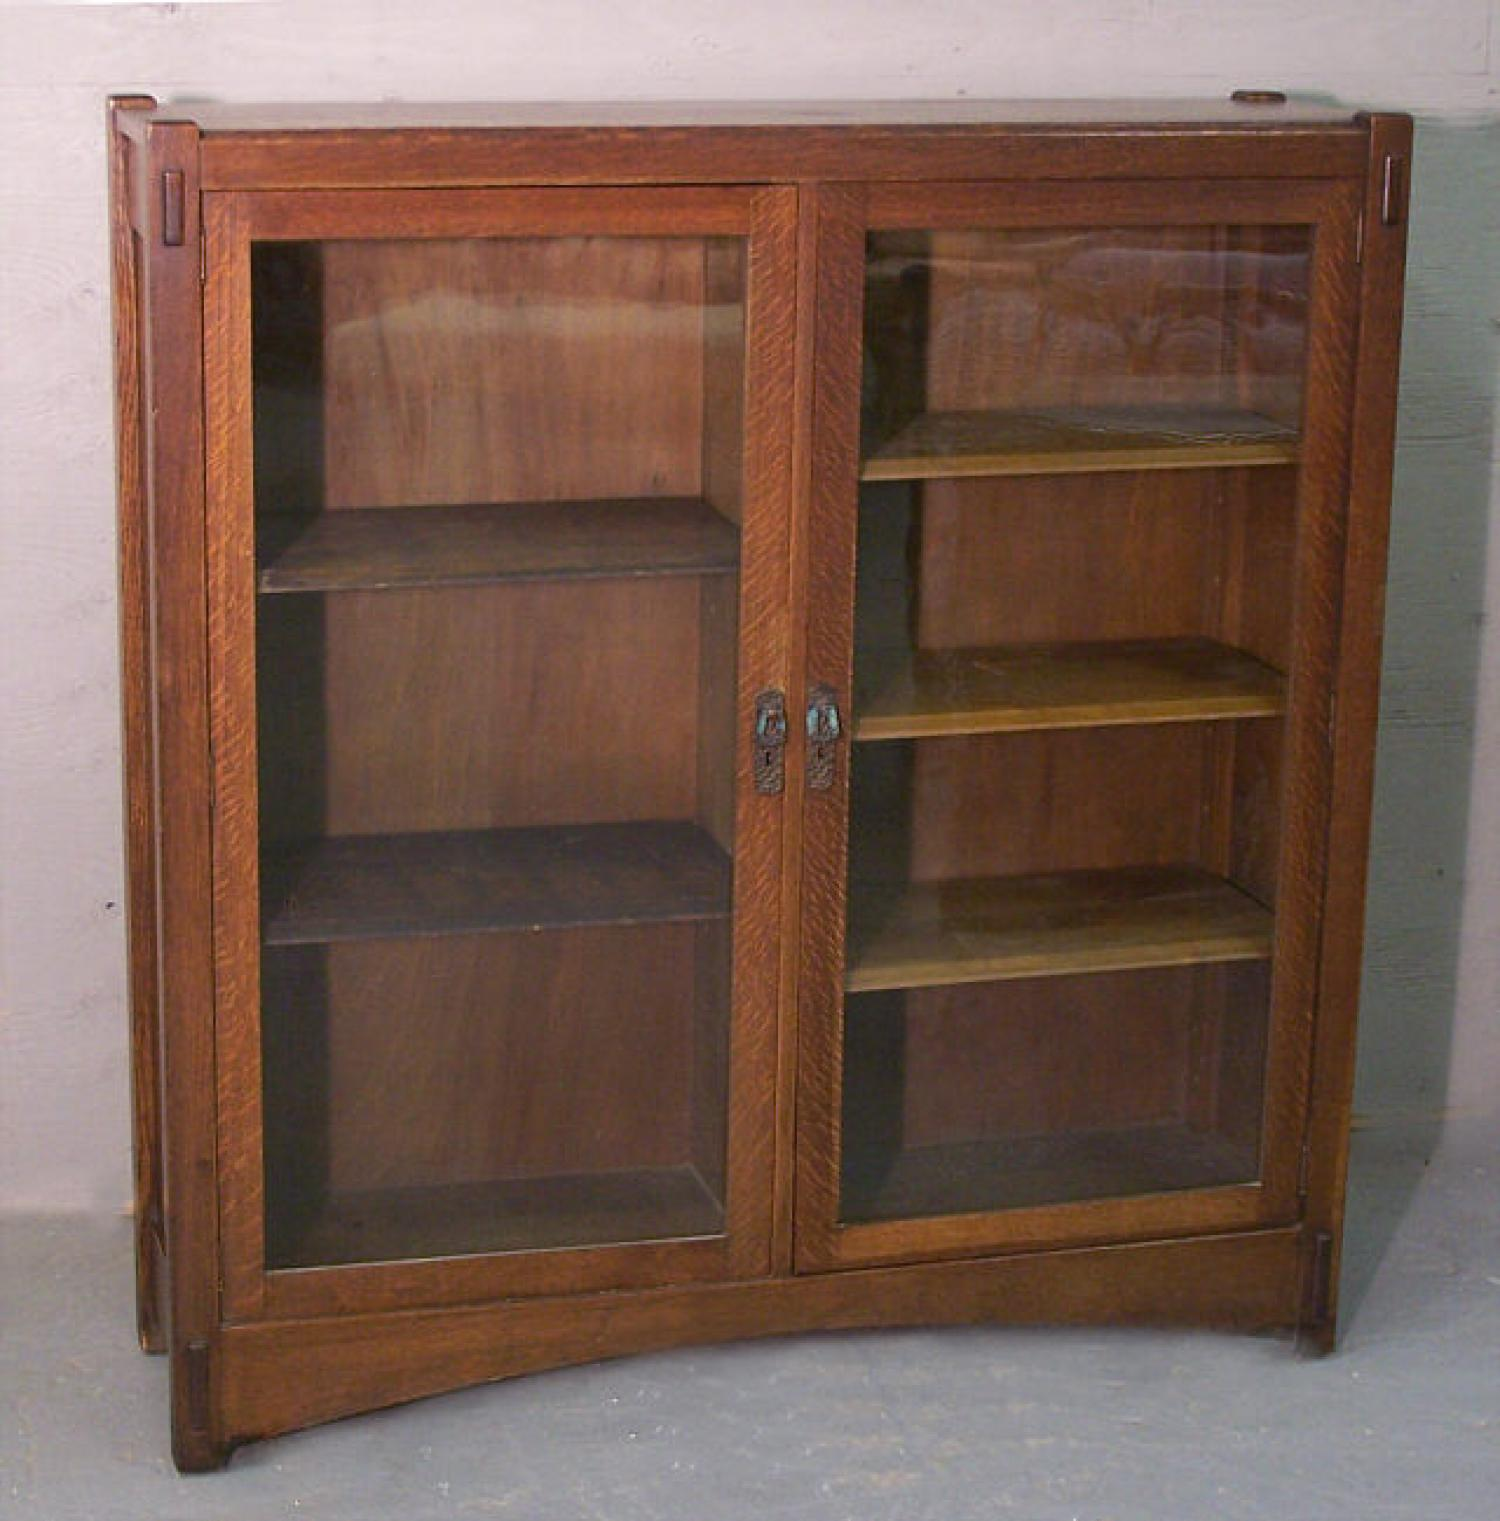 Paine Arts and Crafts quarter sewn oak double door bookcase